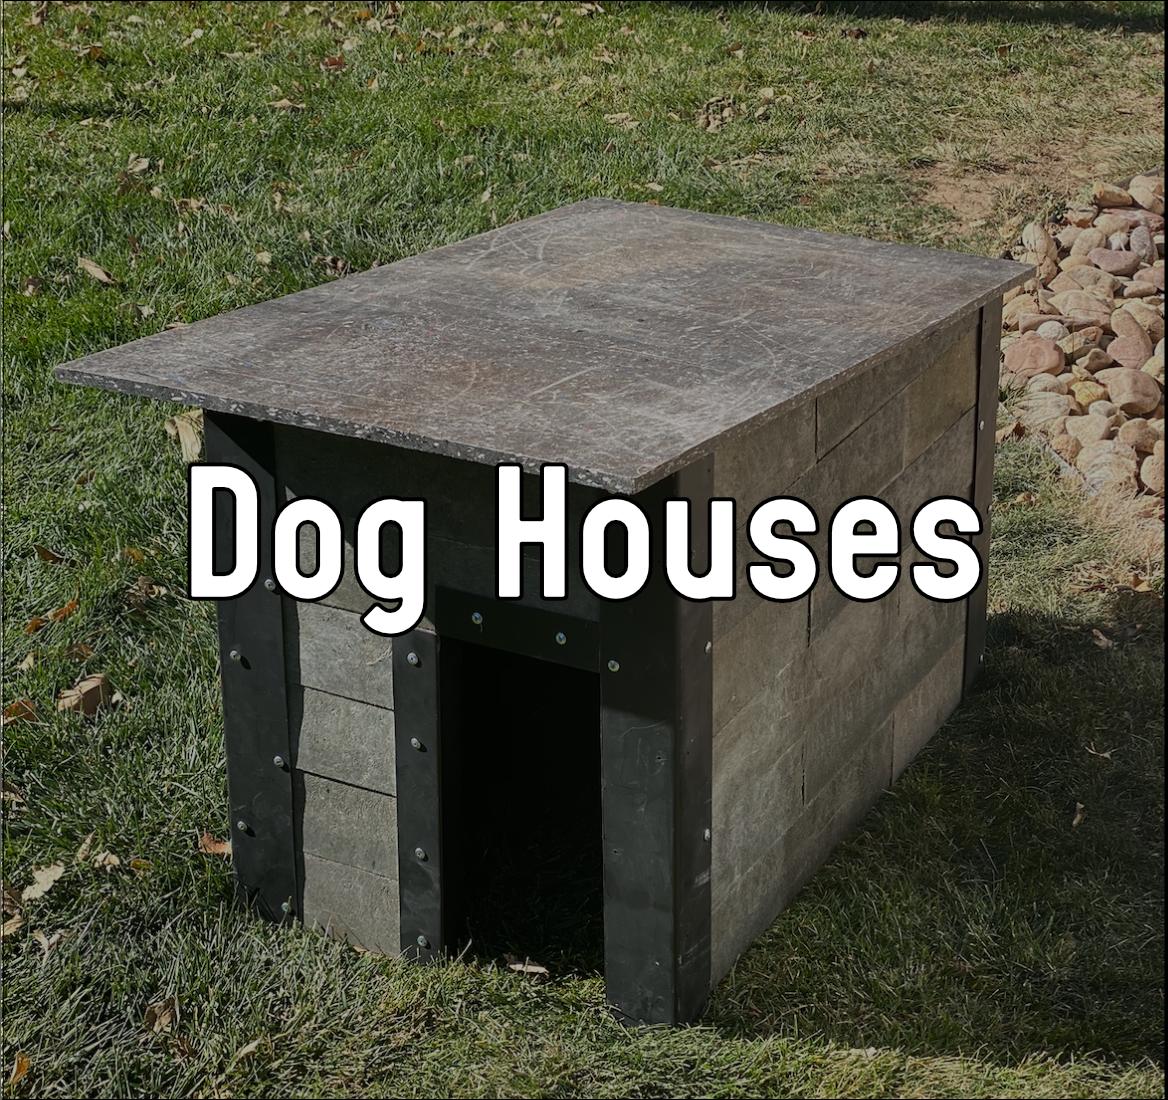 Dog house made out of ReBlock bricks